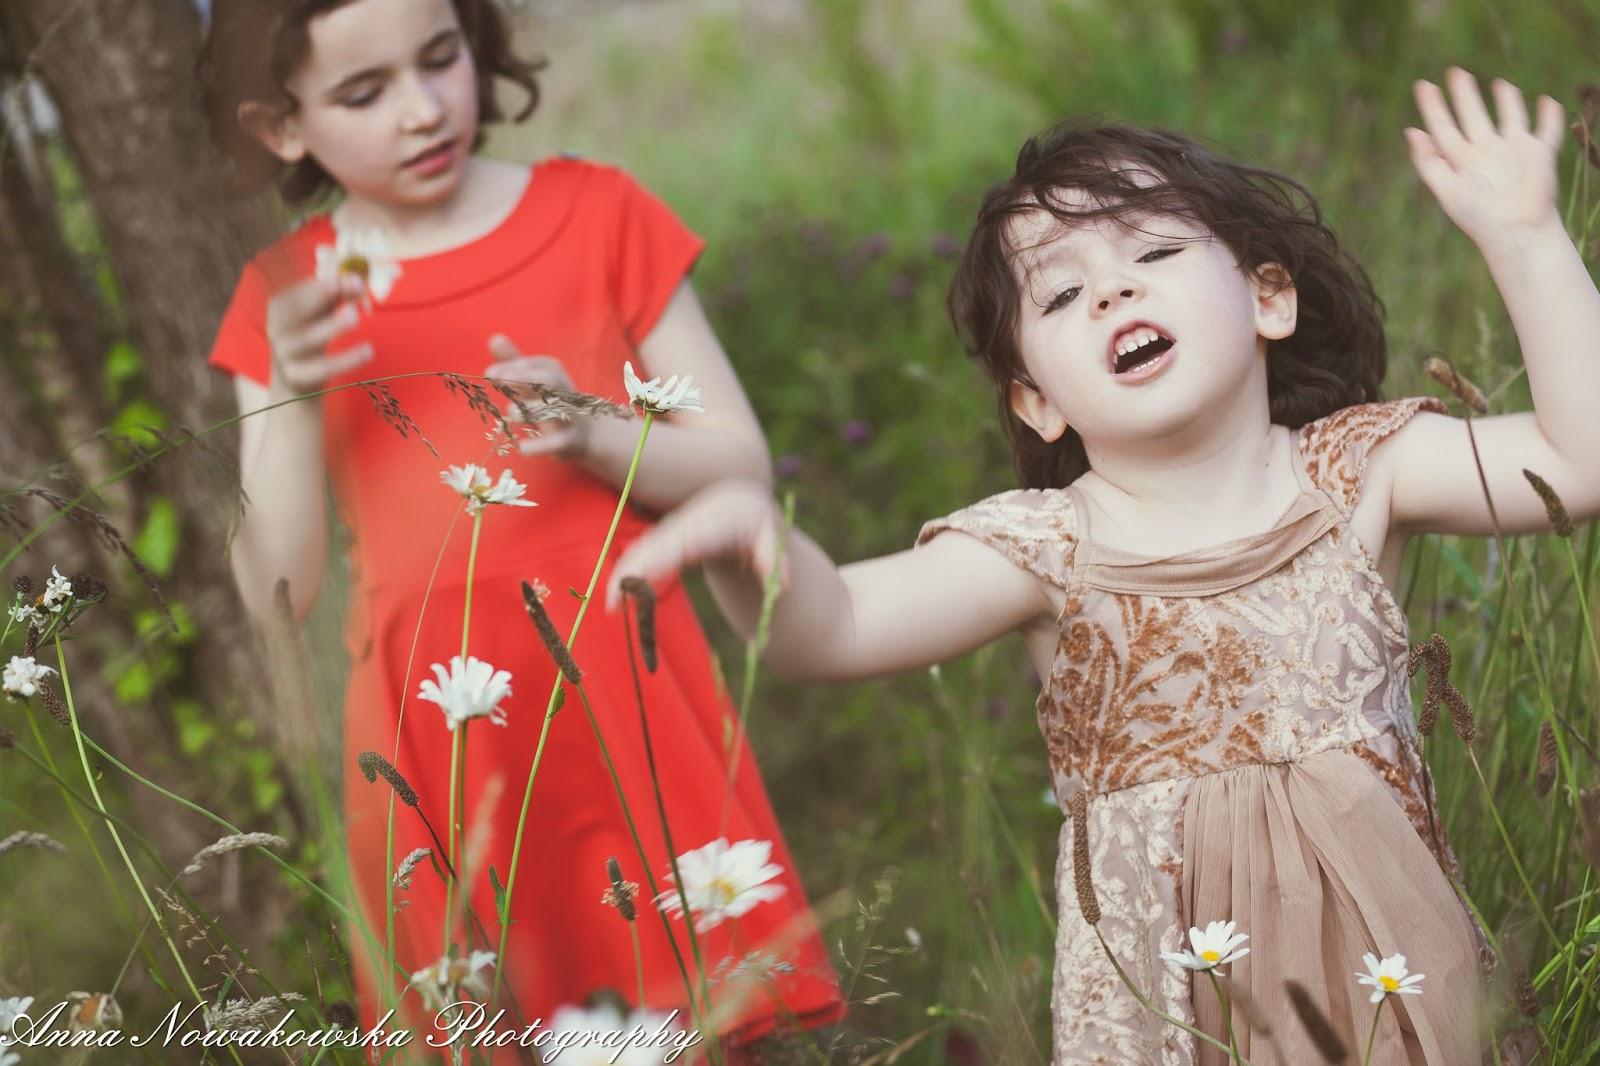 Beautiful candid girls photography by Anna Nowakowska   Dublin